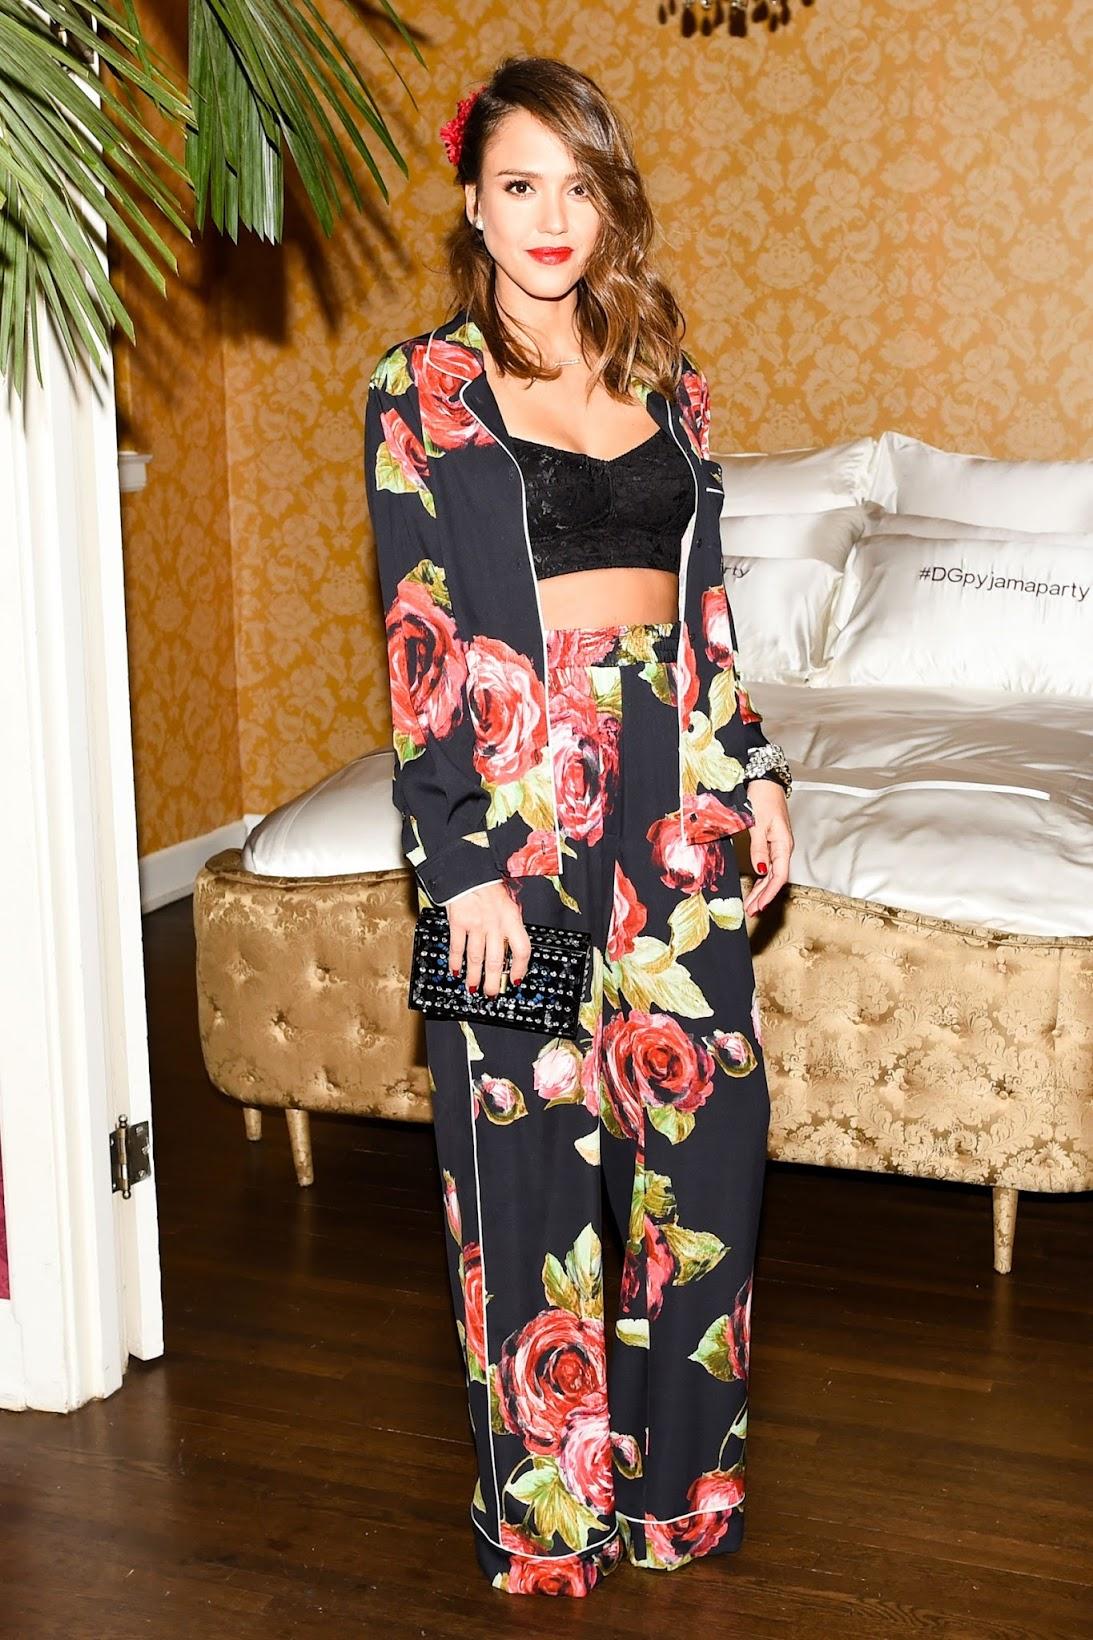 Jessica Alba at Dolce & Gabbana Pyjama Party 2016, Dolce & Gabbana Pyjama Party 2016- Who wore what